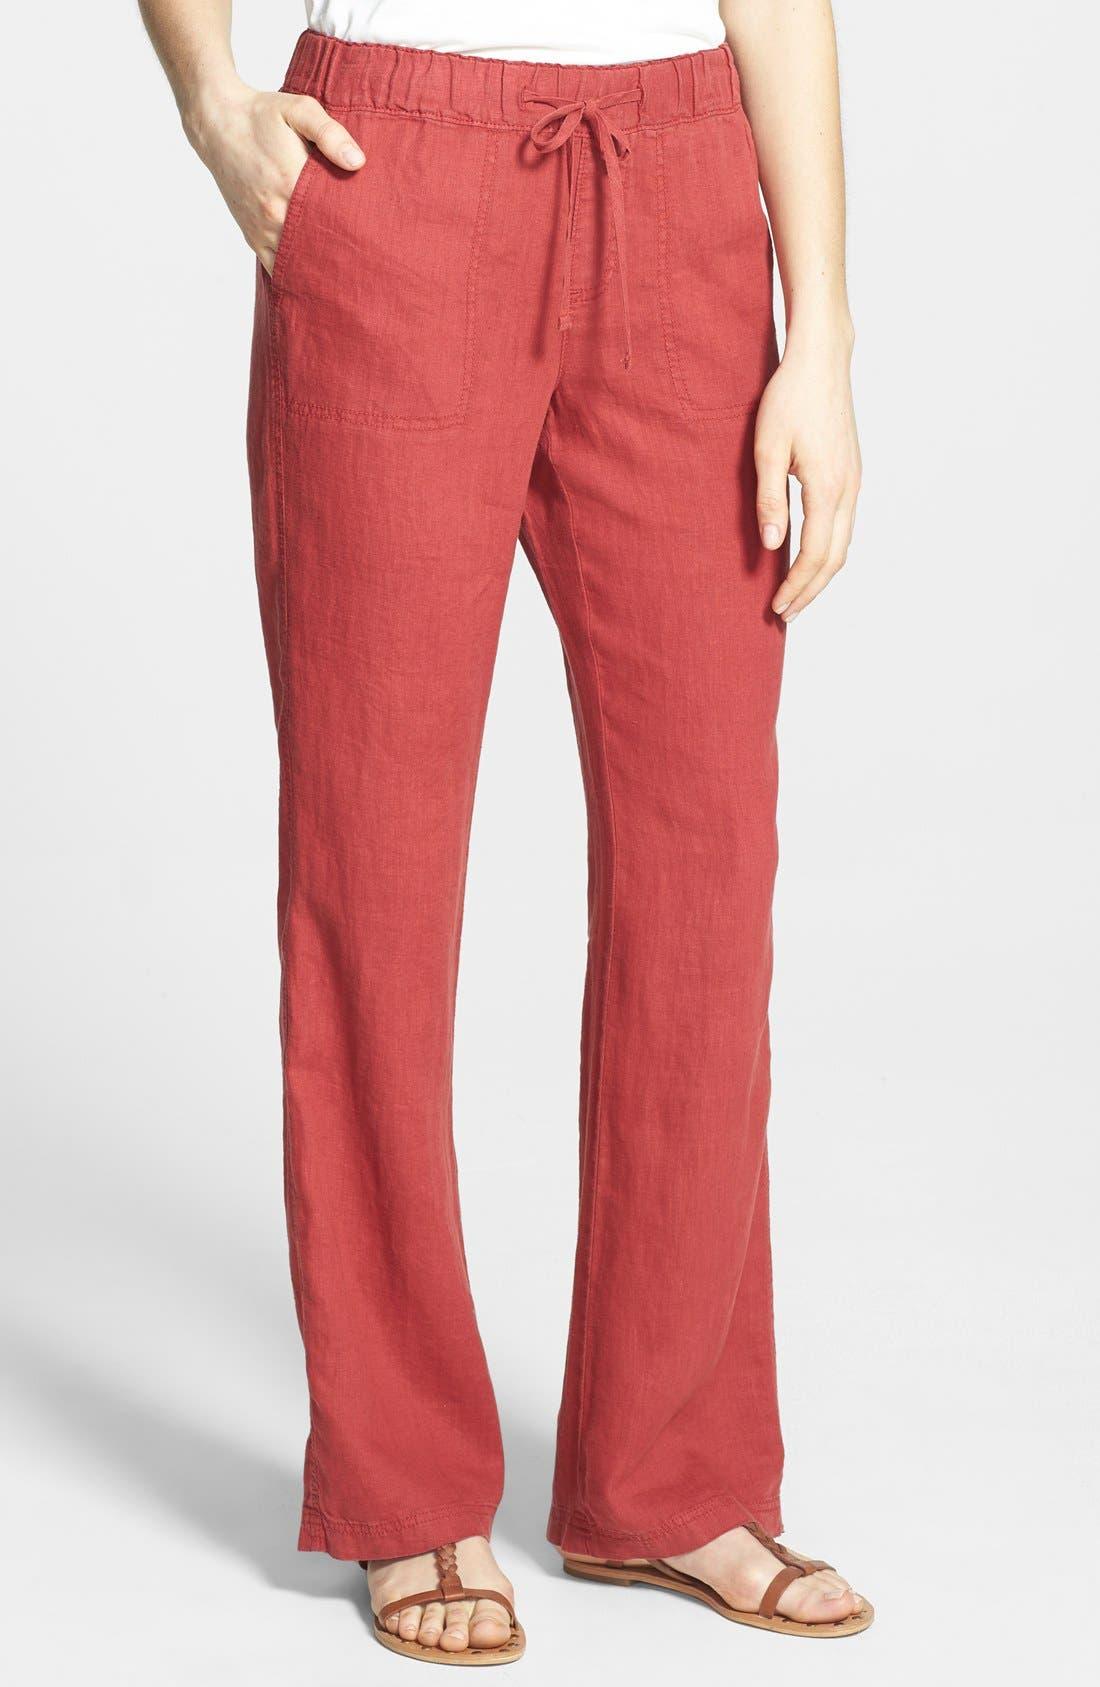 Alternate Image 1 Selected - Caslon® Drawstring Waist Linen Pants (Regular & Petite)